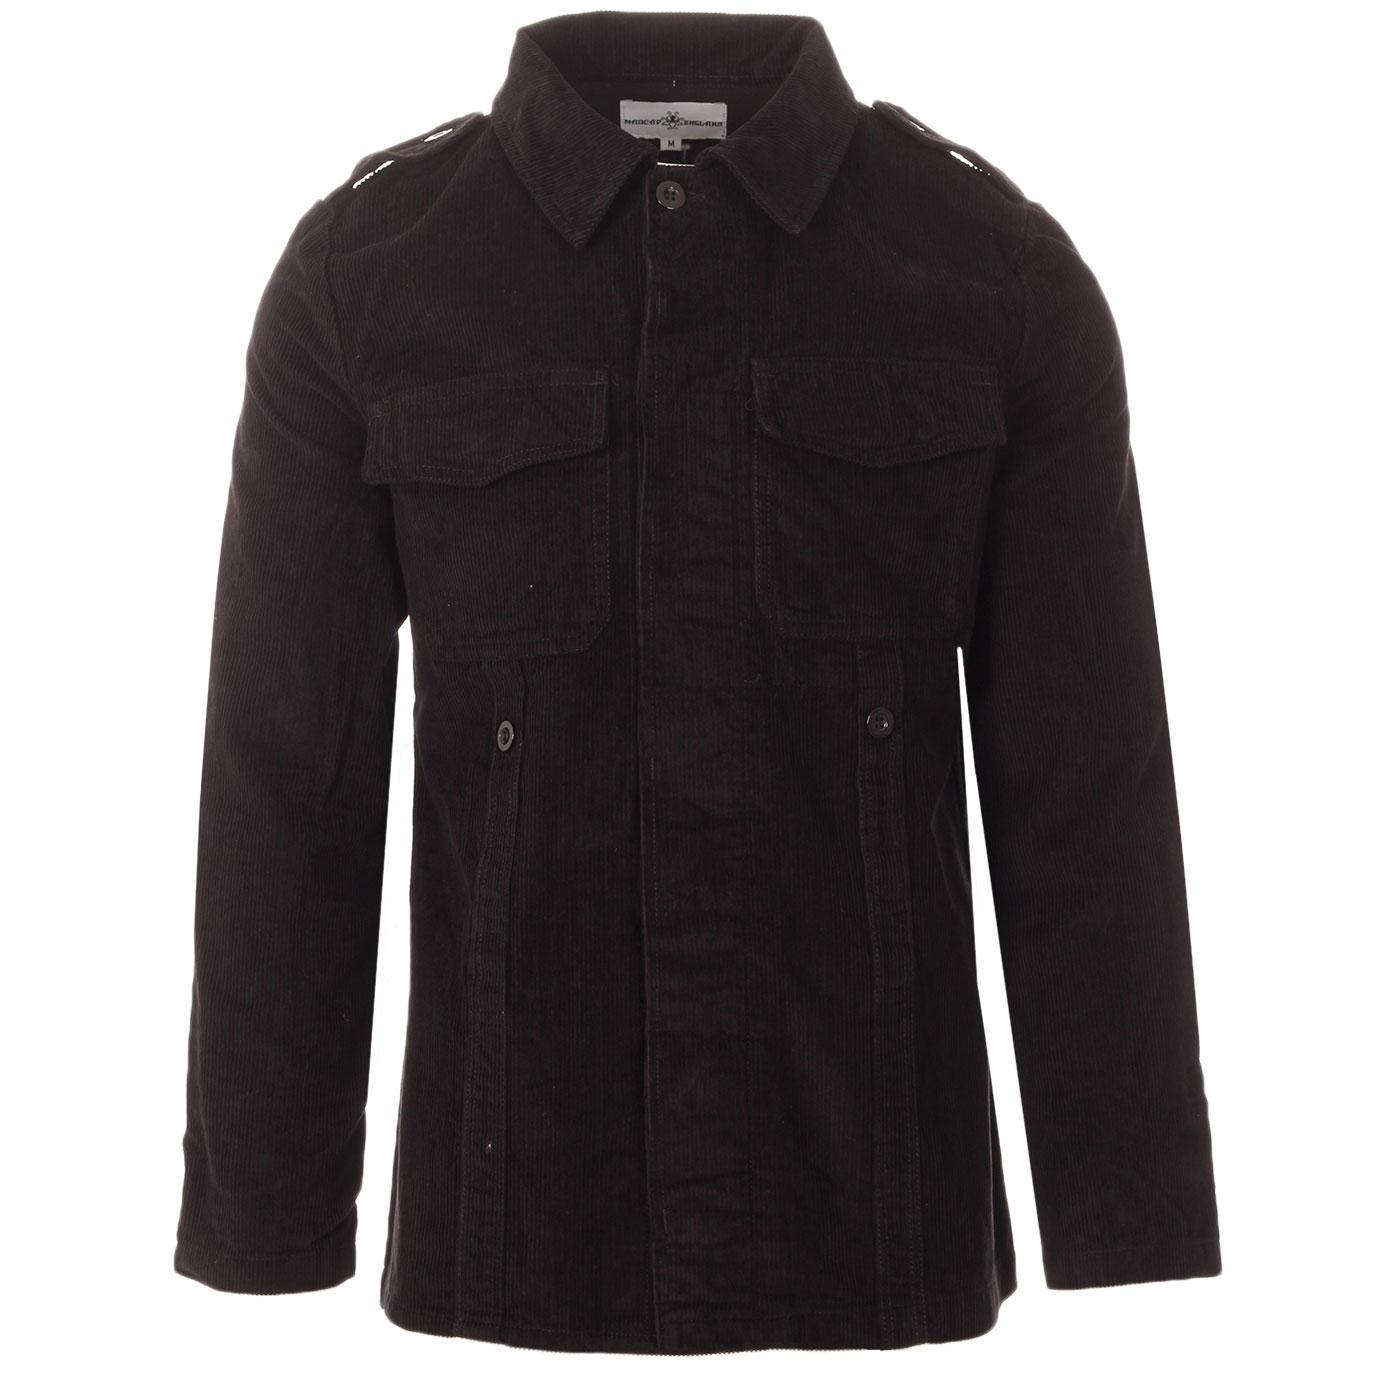 Madcap England Lennon Retro Mod Cord Military Shirt Jacket in Black